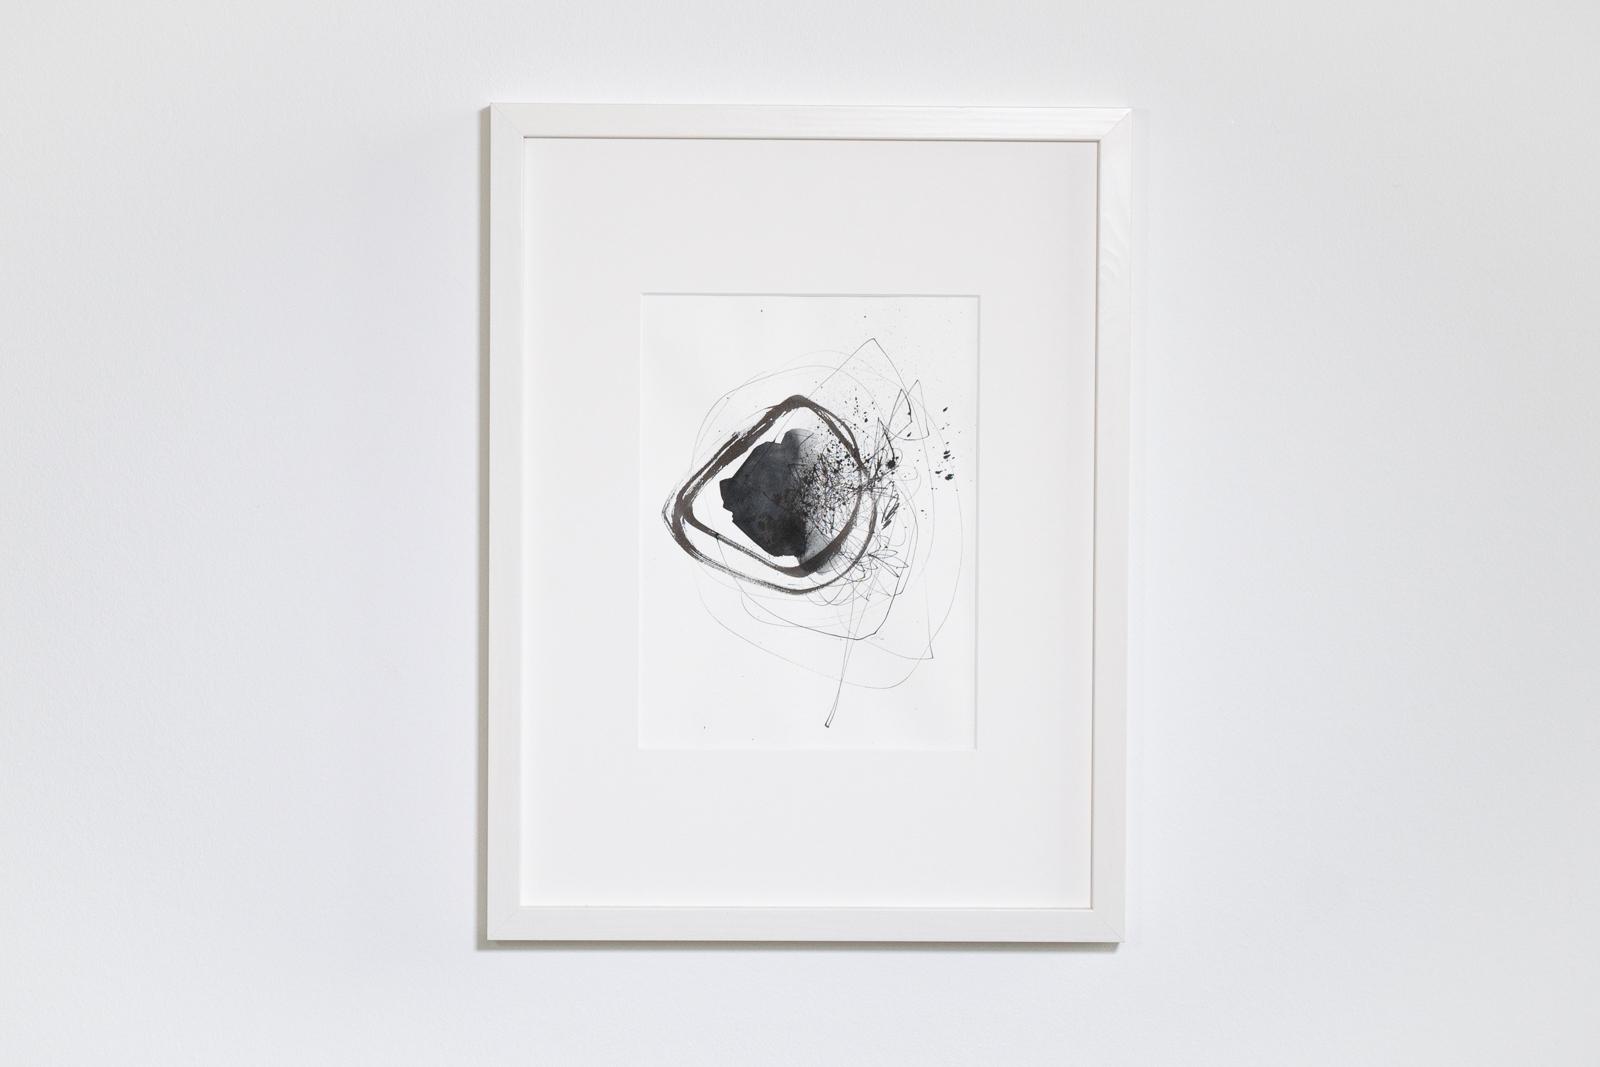 2018_StudioRehme_Ruetten_Paintings-14.jpg